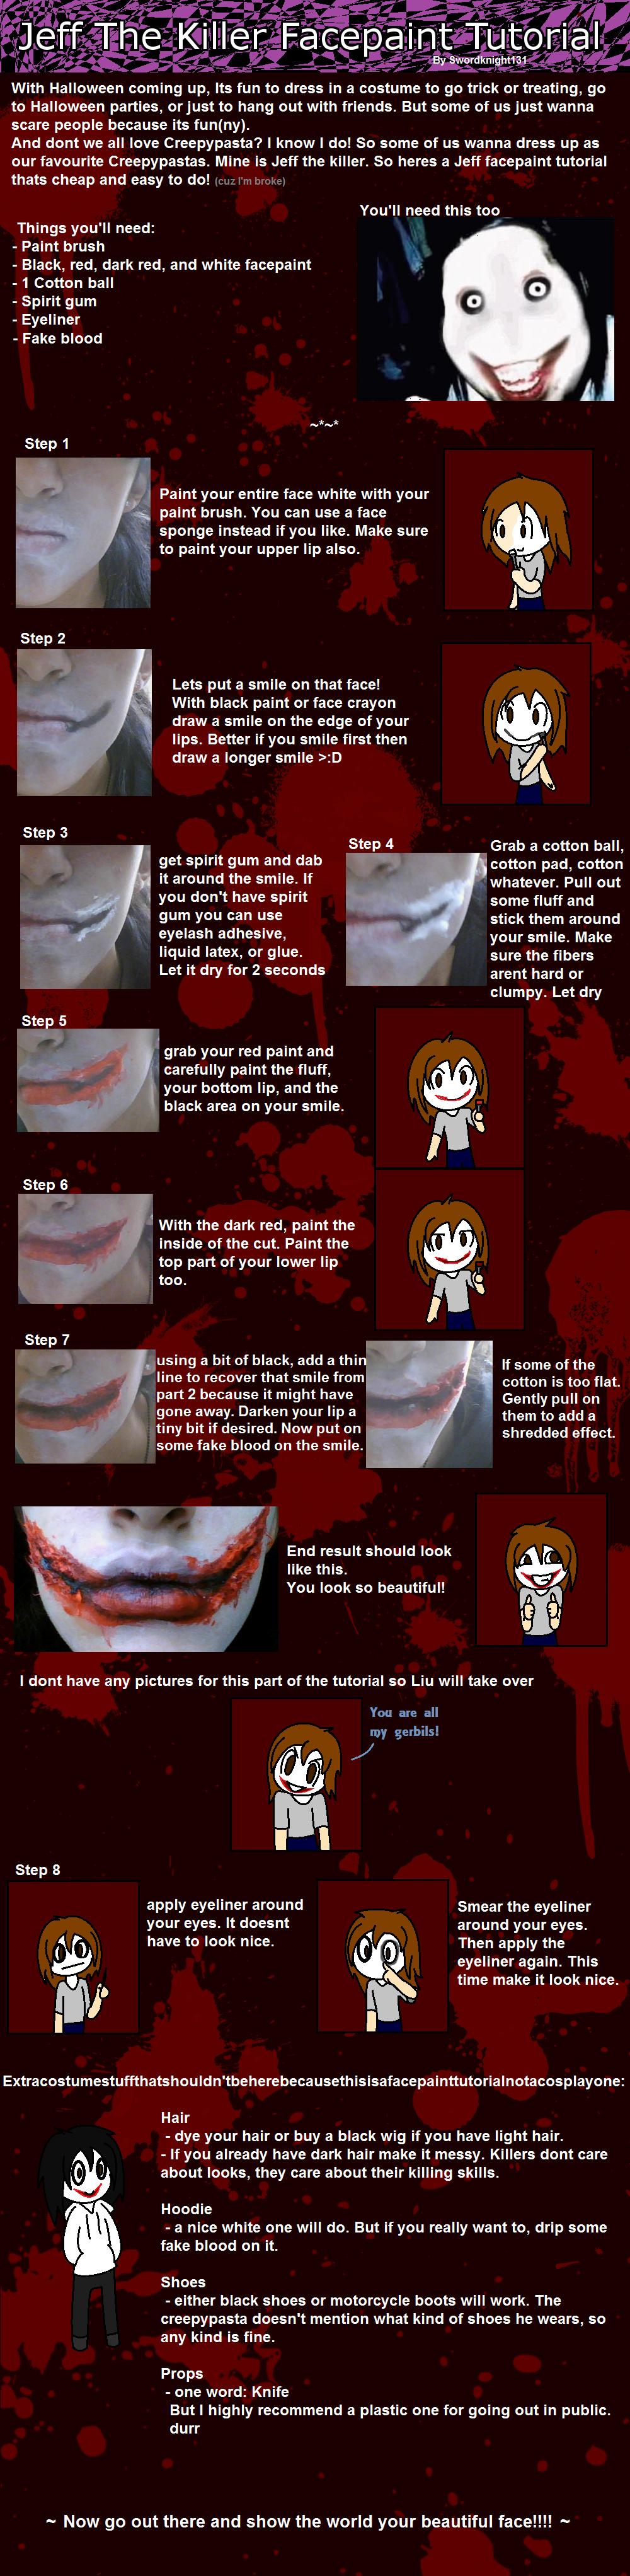 Epic Jeff the killer facepaint tutorial by SwordKnight131